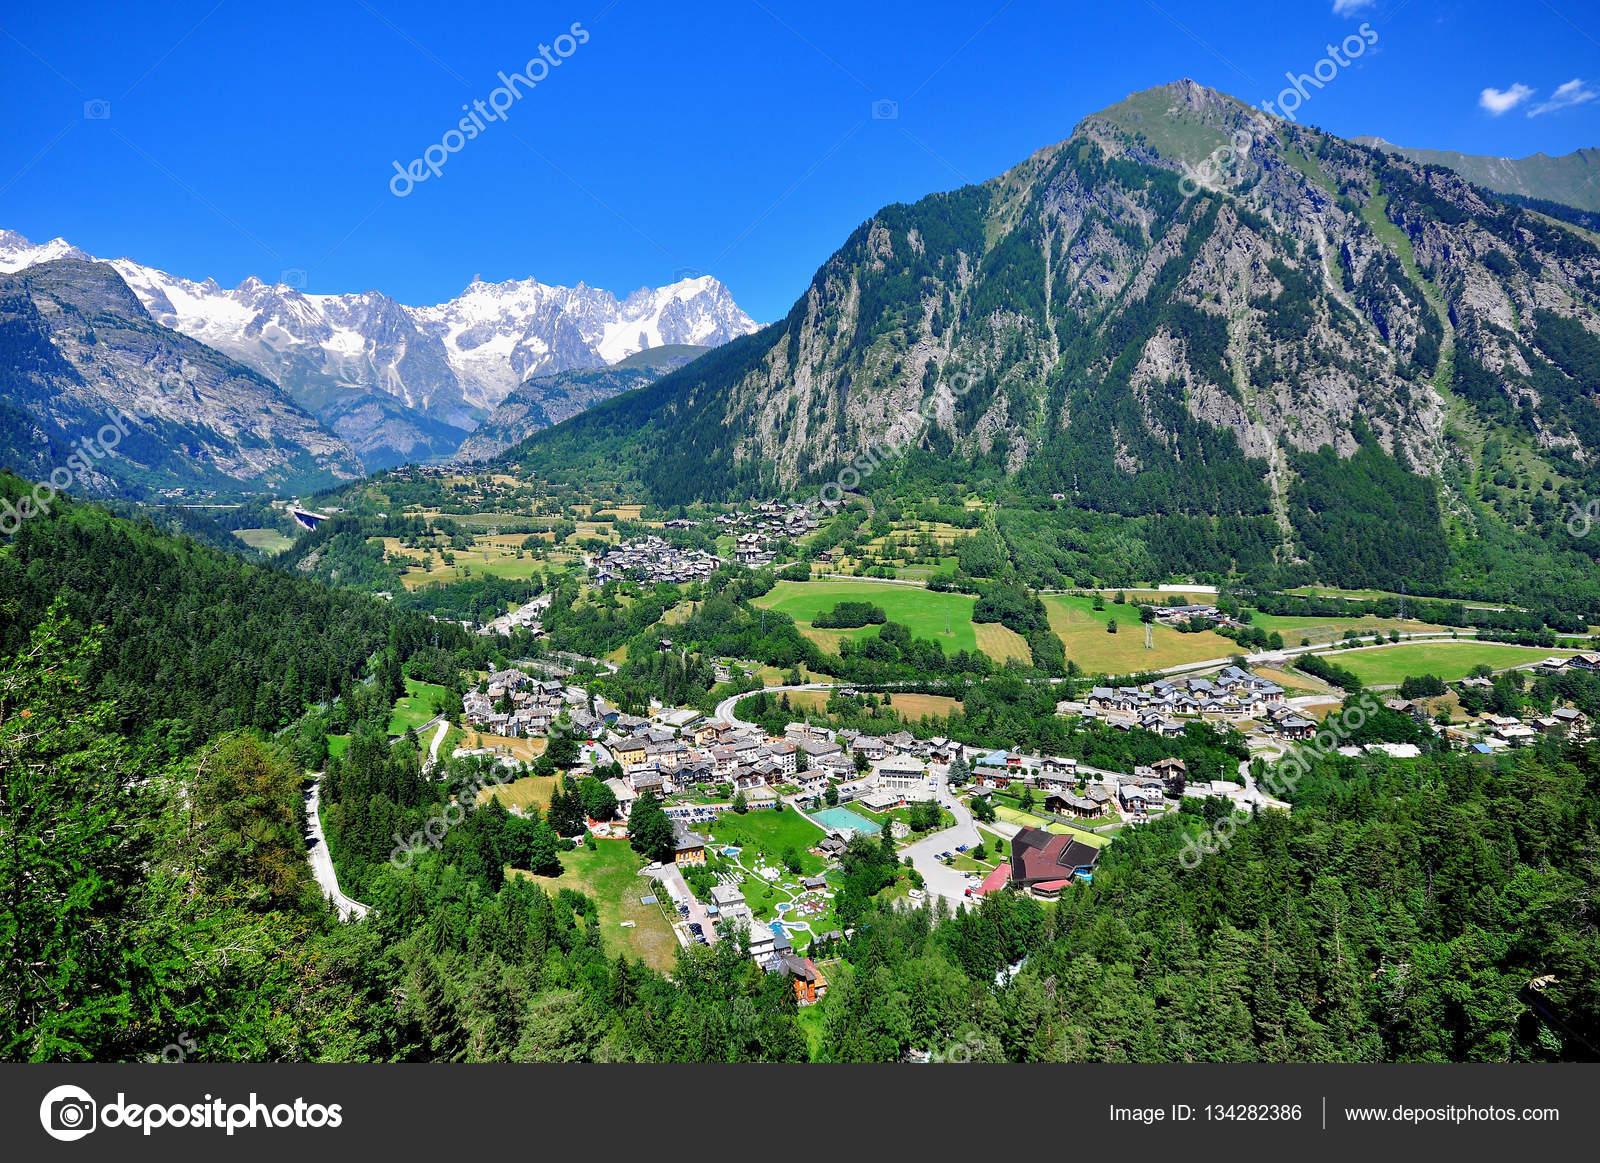 magnifique paysage de montagne en italie du nord photographie krasnevsky 134282386. Black Bedroom Furniture Sets. Home Design Ideas